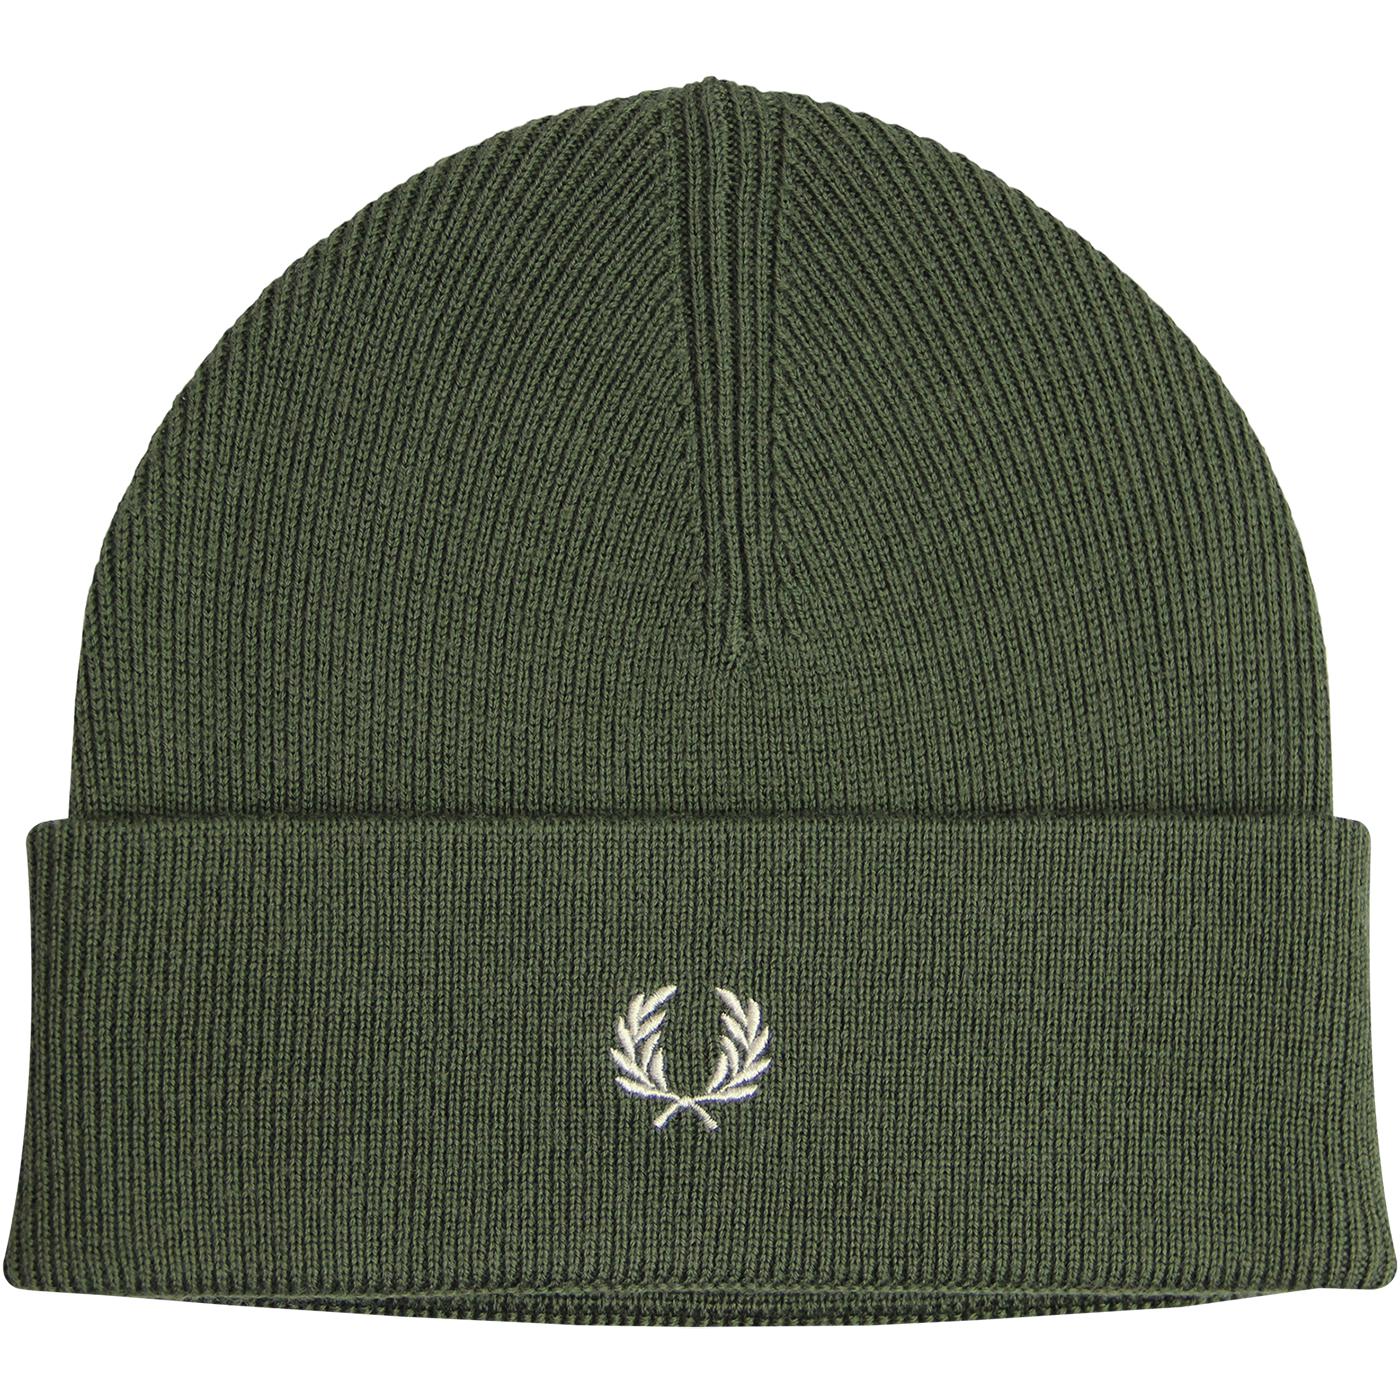 FRED PERRY Merino Wool Knitted Logo Beanie Hat (O)